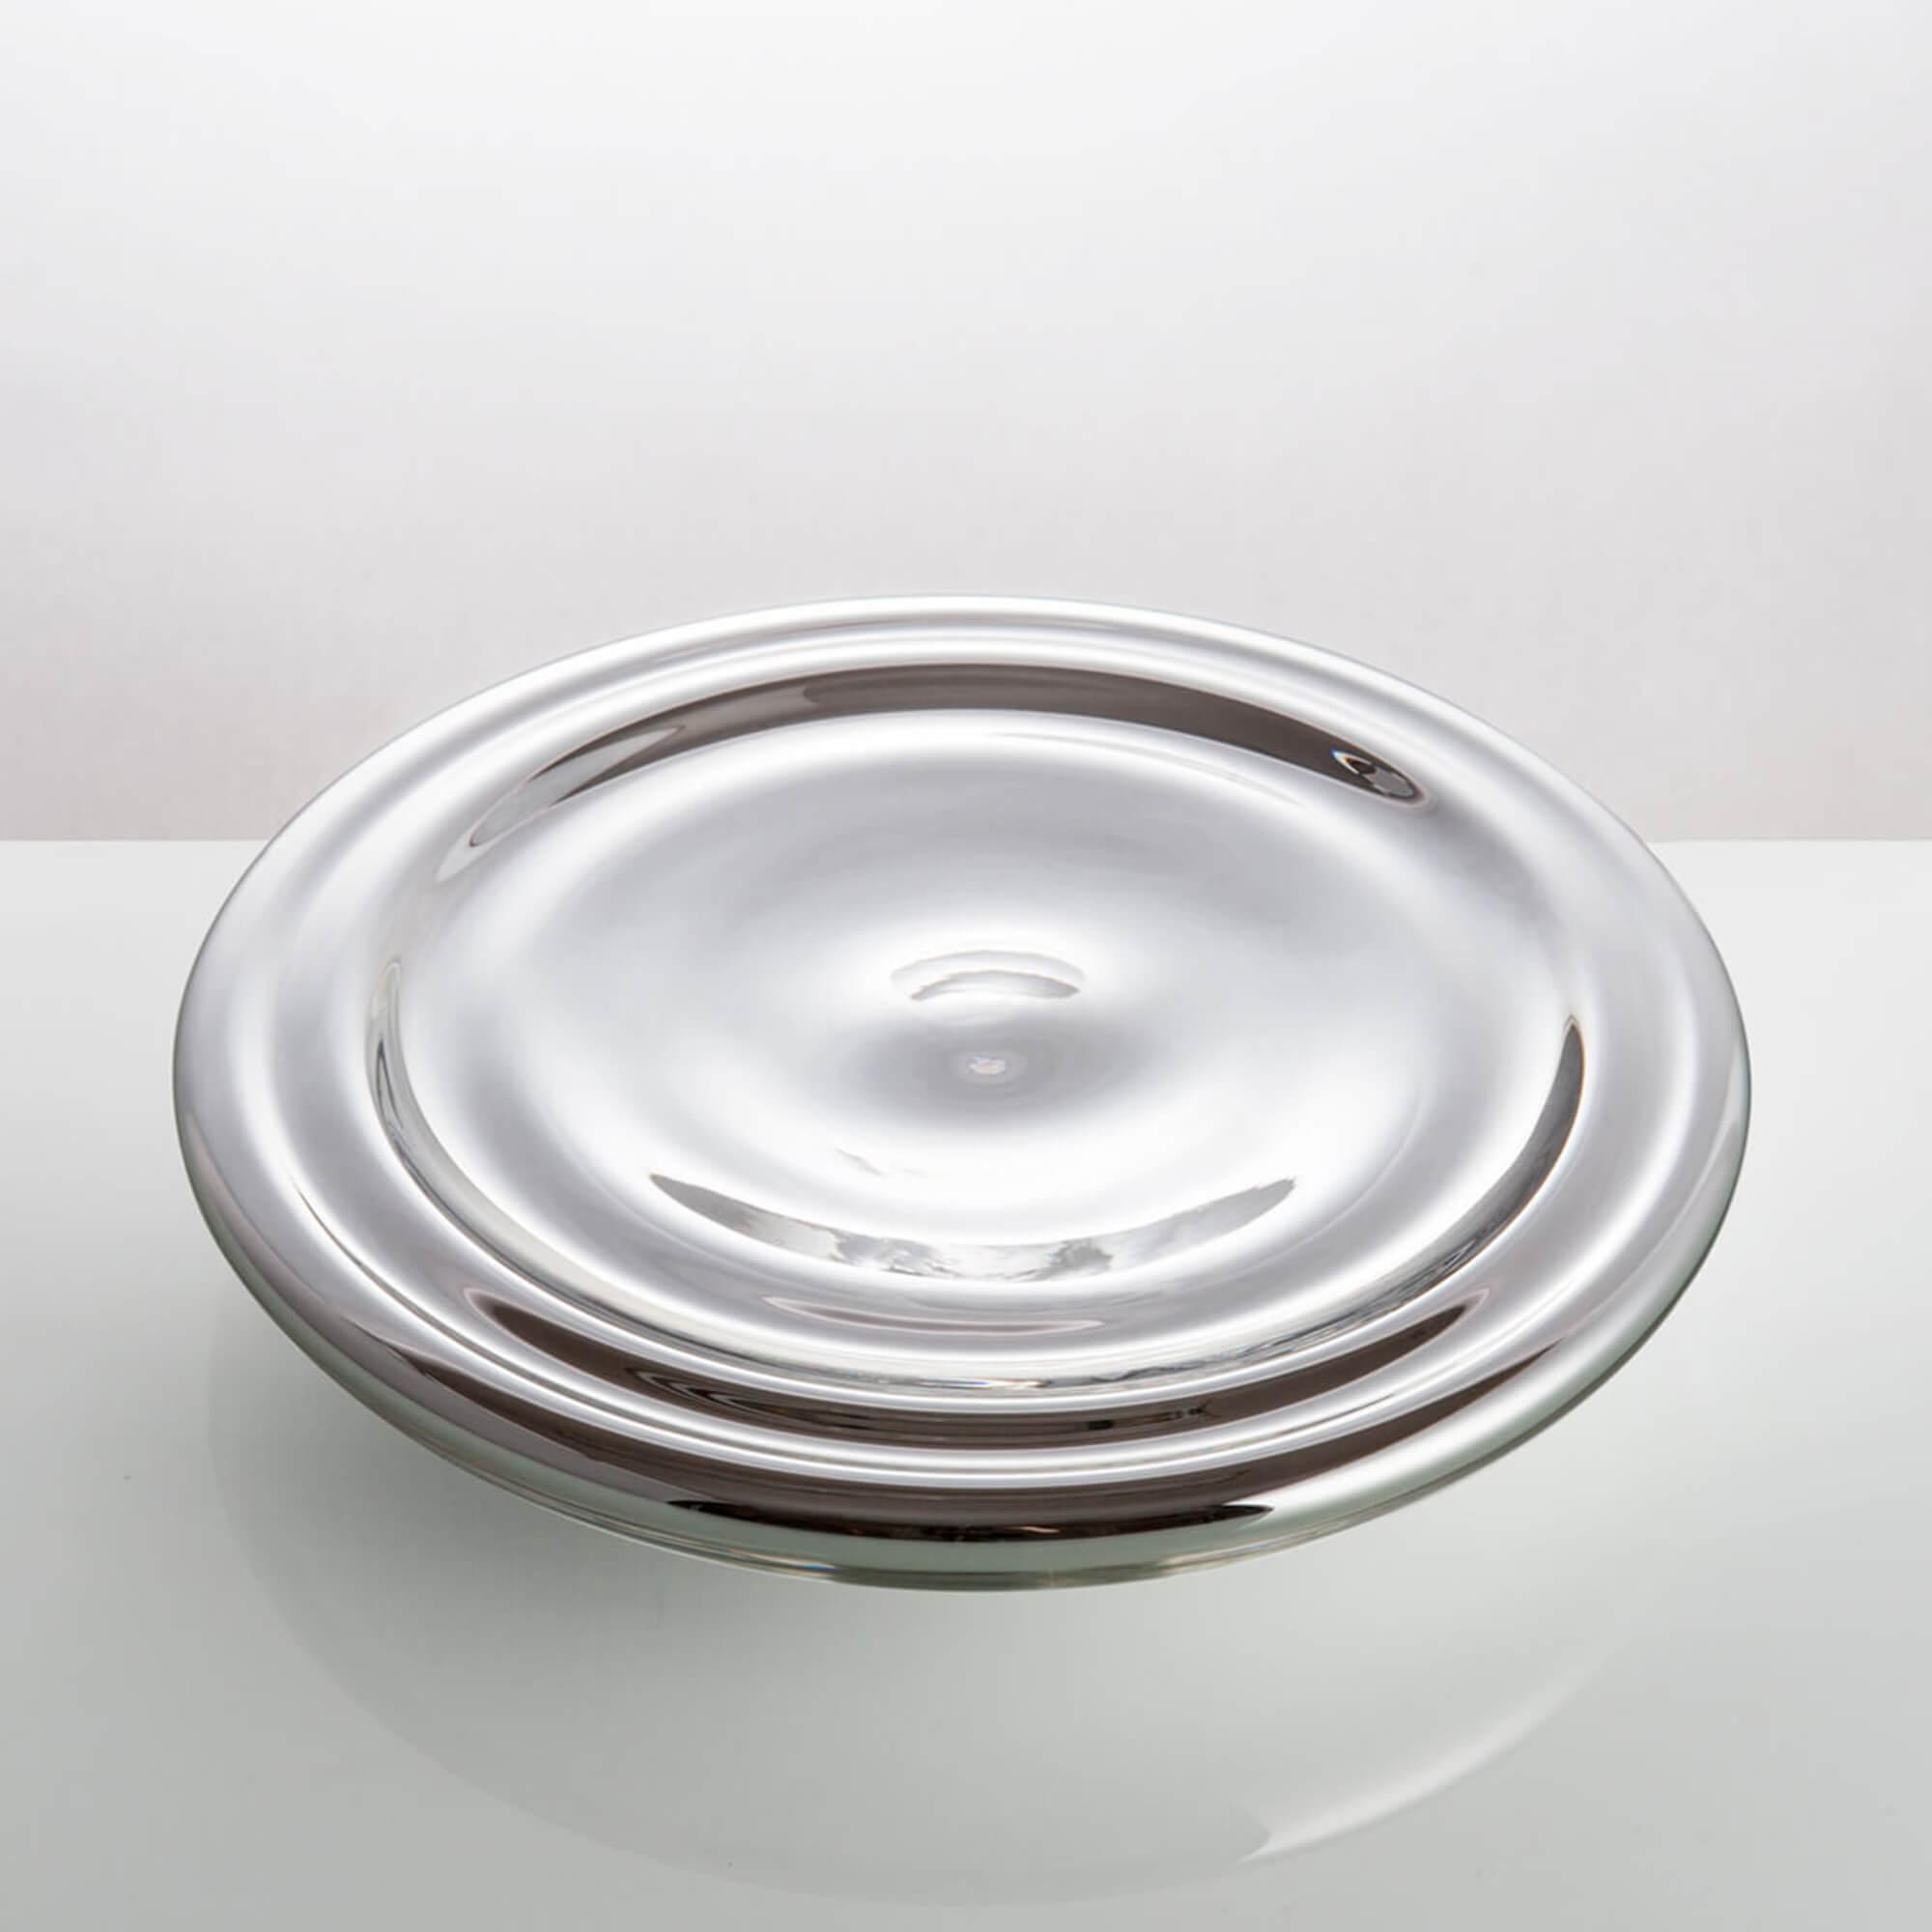 Silver glass serving bowl by Michal Prazsky